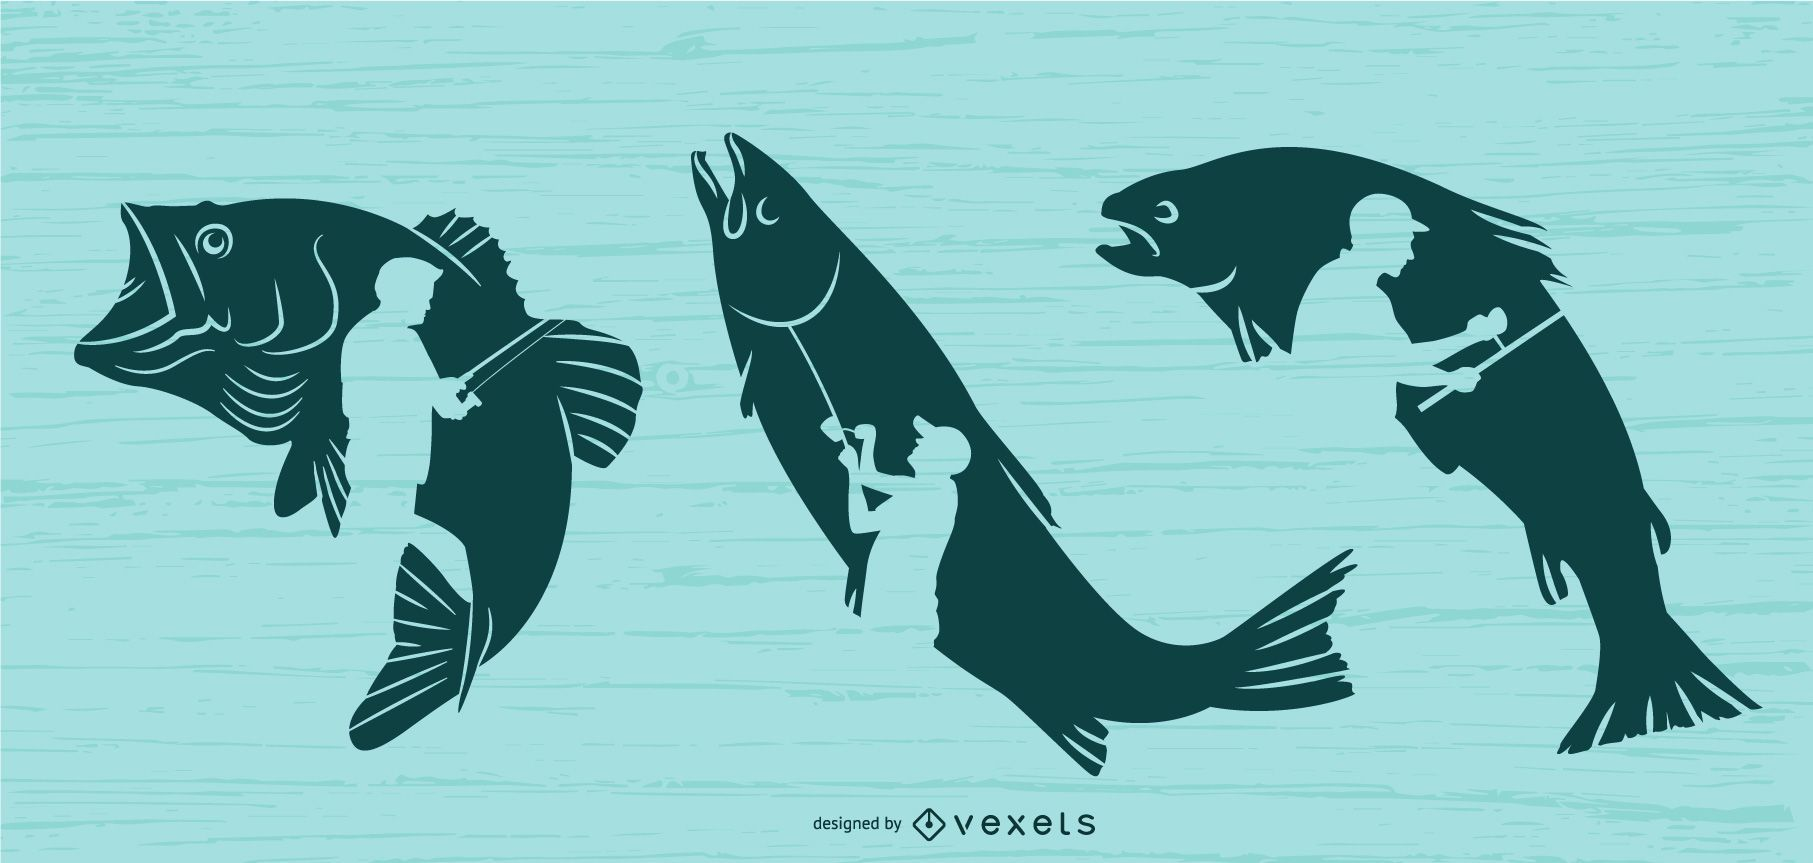 Fishing illustration set